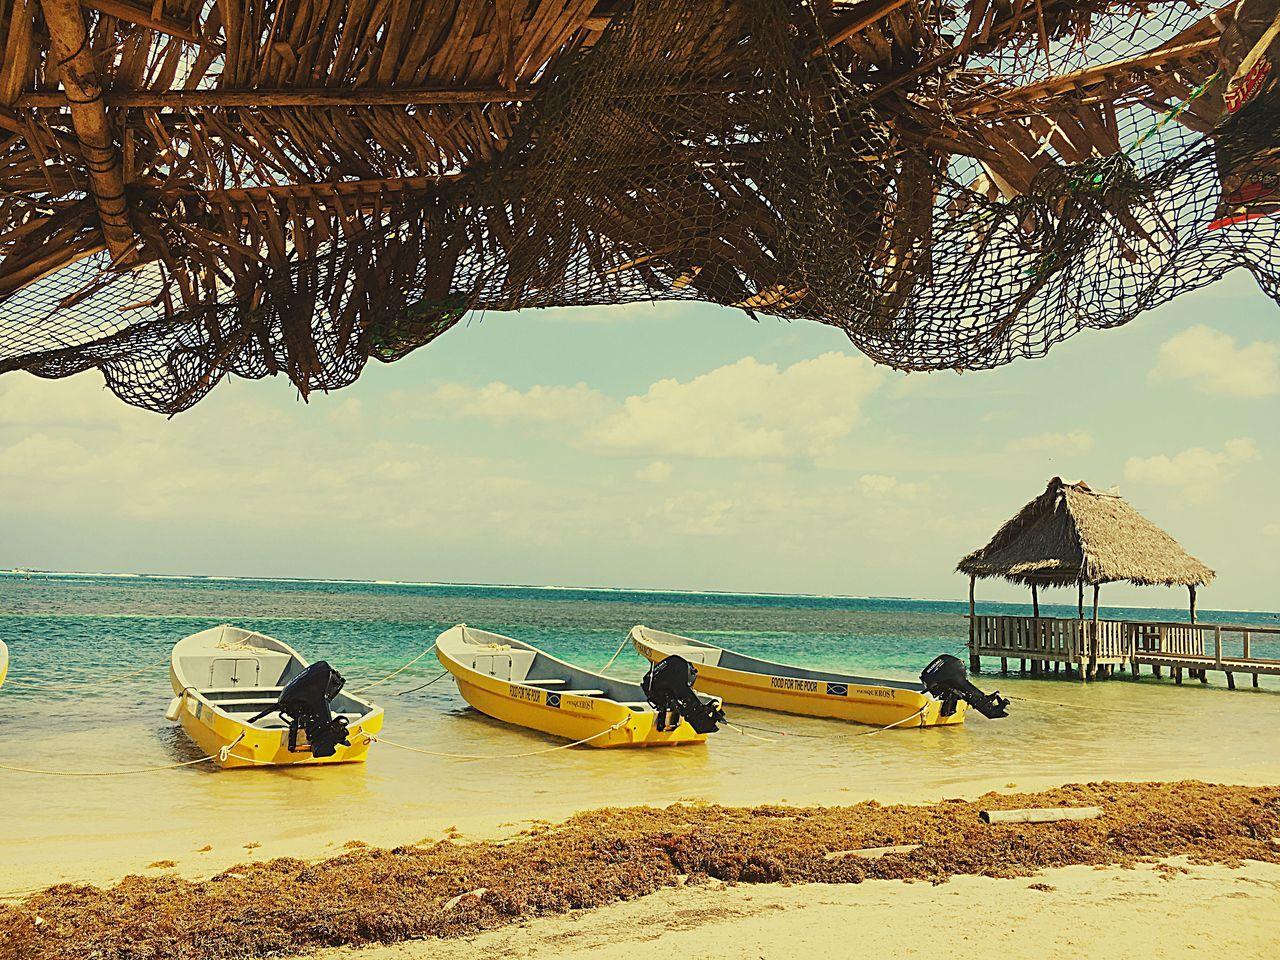 Garifuna Shore. Beach Blue Sky Transportation Sea Honduras Hondurasturistica